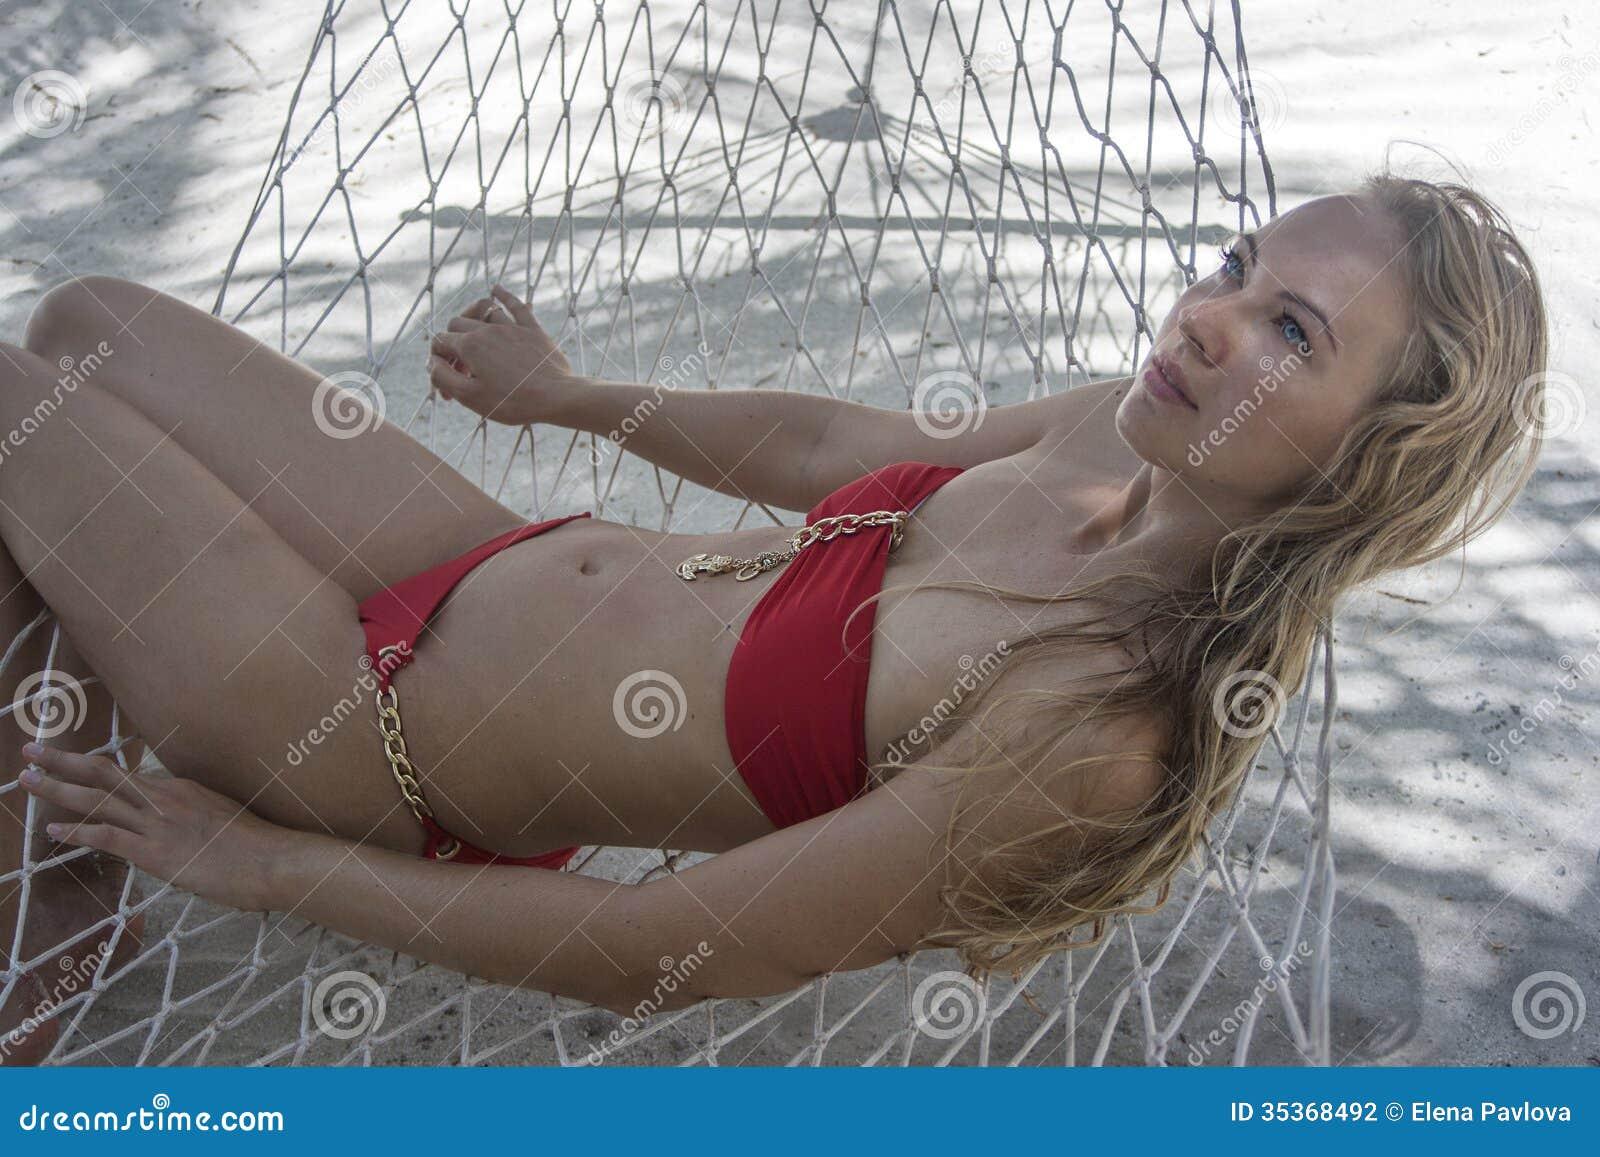 hammock Bikini in